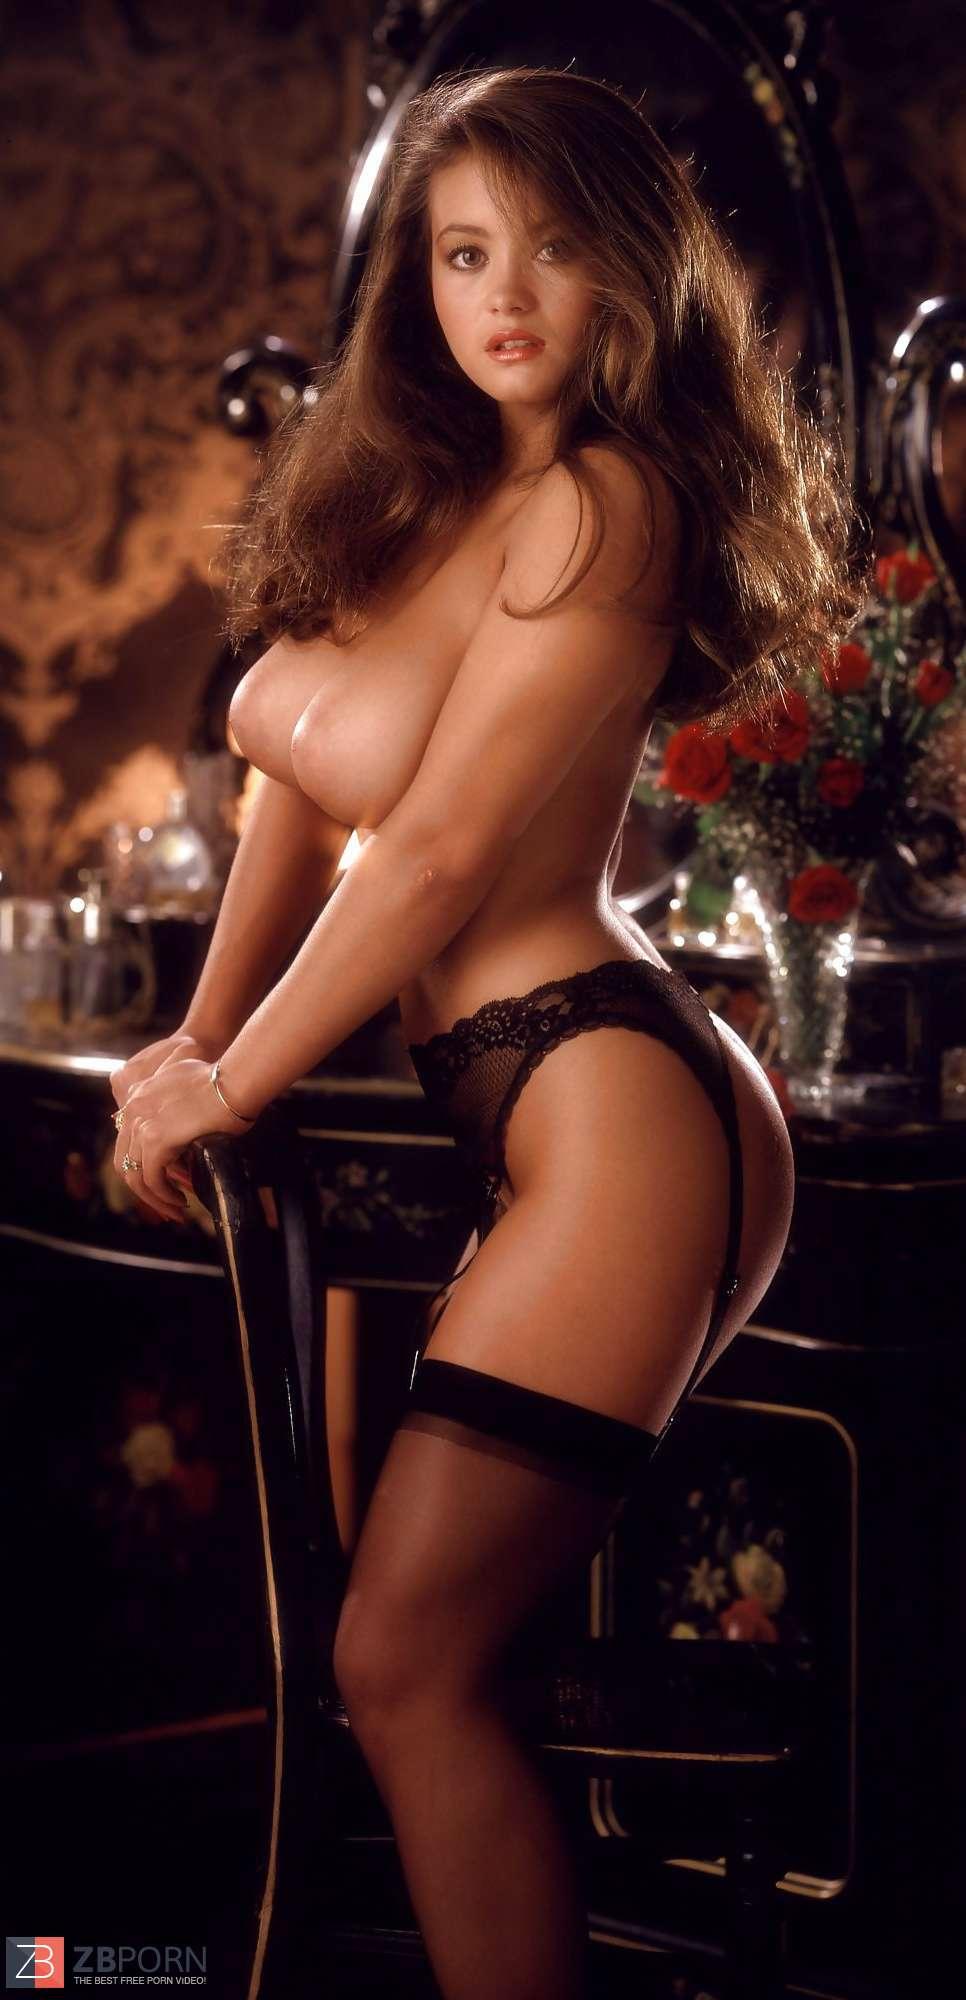 Andressa Soares Naked vintage breasts - alana soares / zb porn